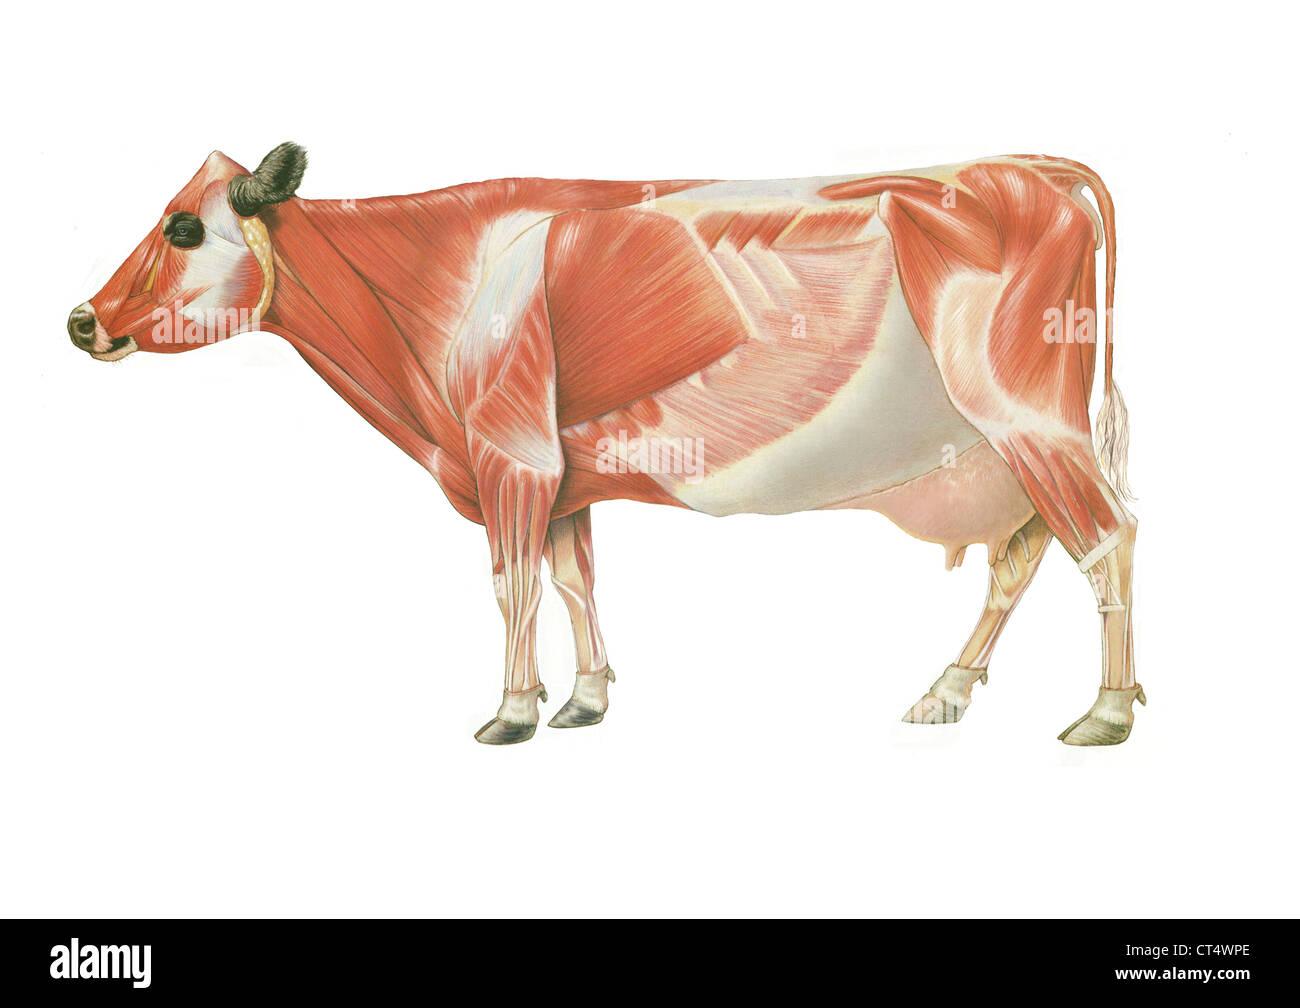 COW ANATOMY, DRAWING Stock Photo: 49280518 - Alamy